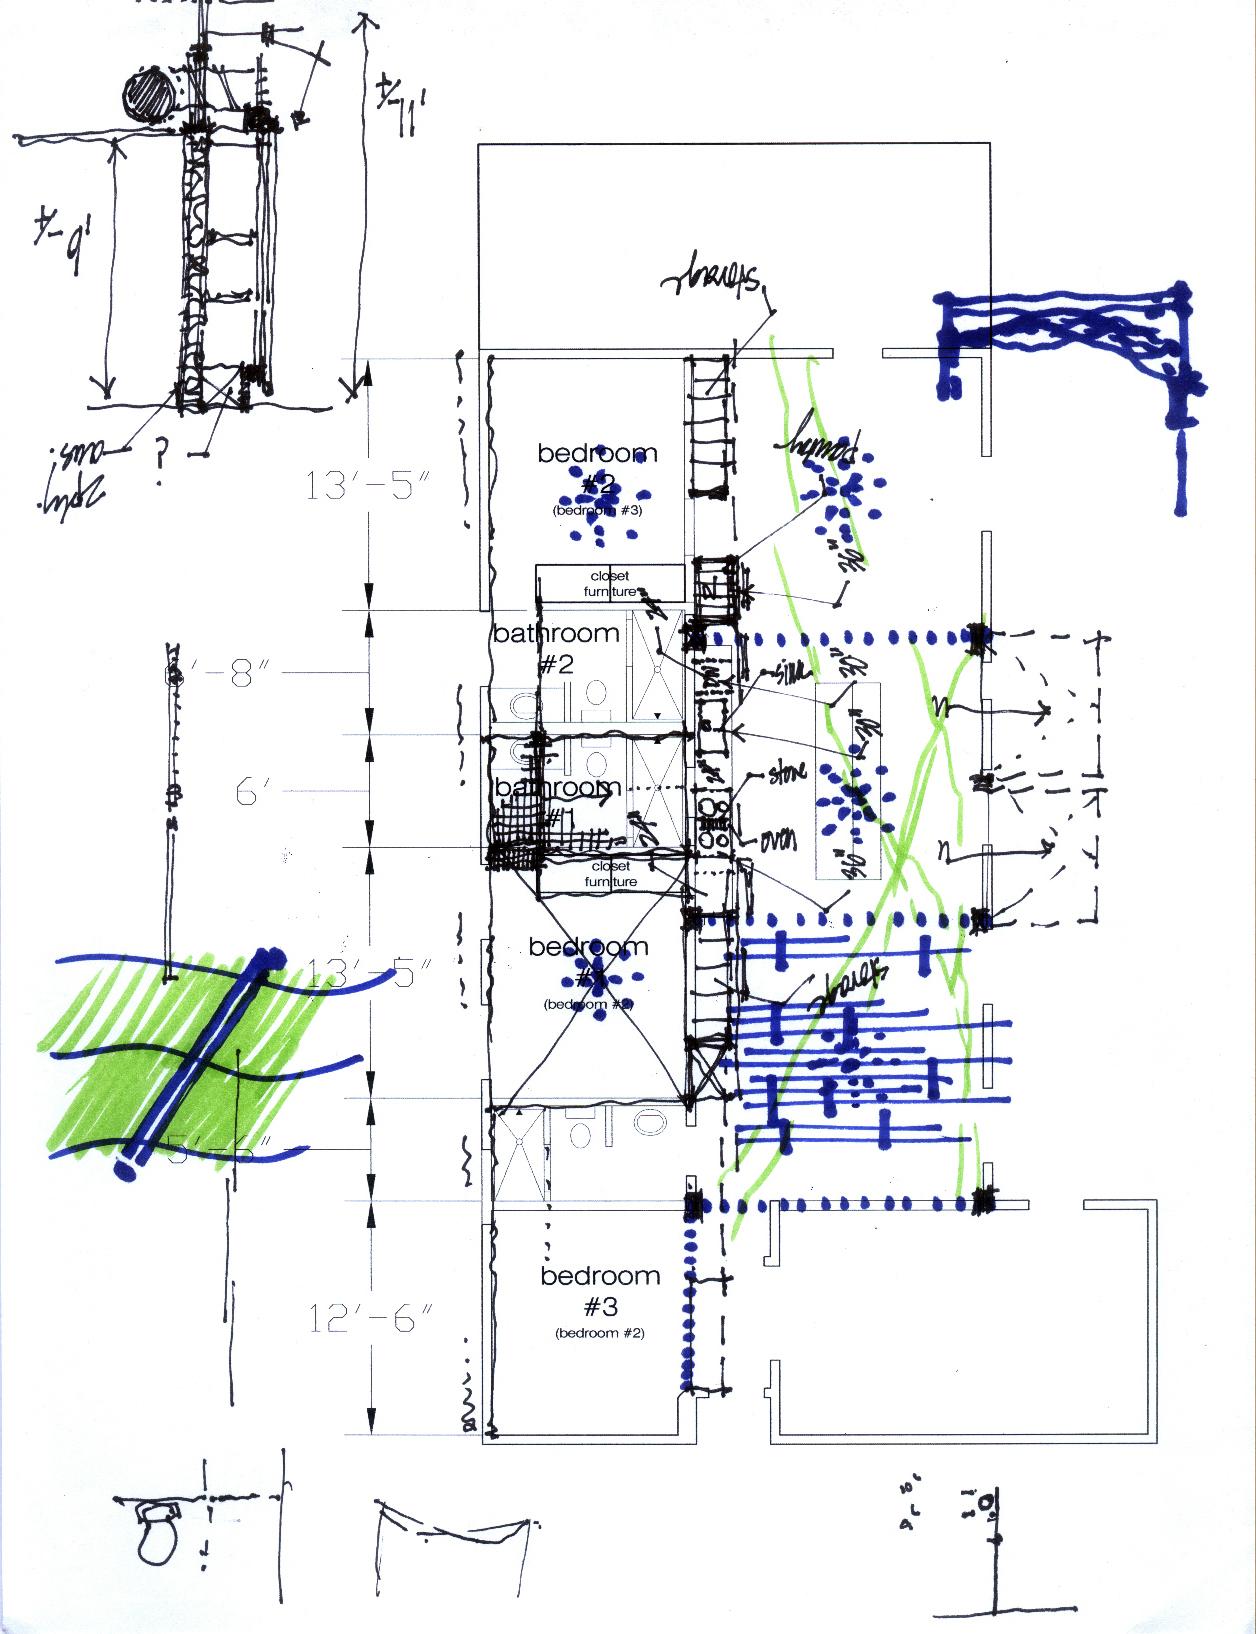 PoD_sketch-1.jpg